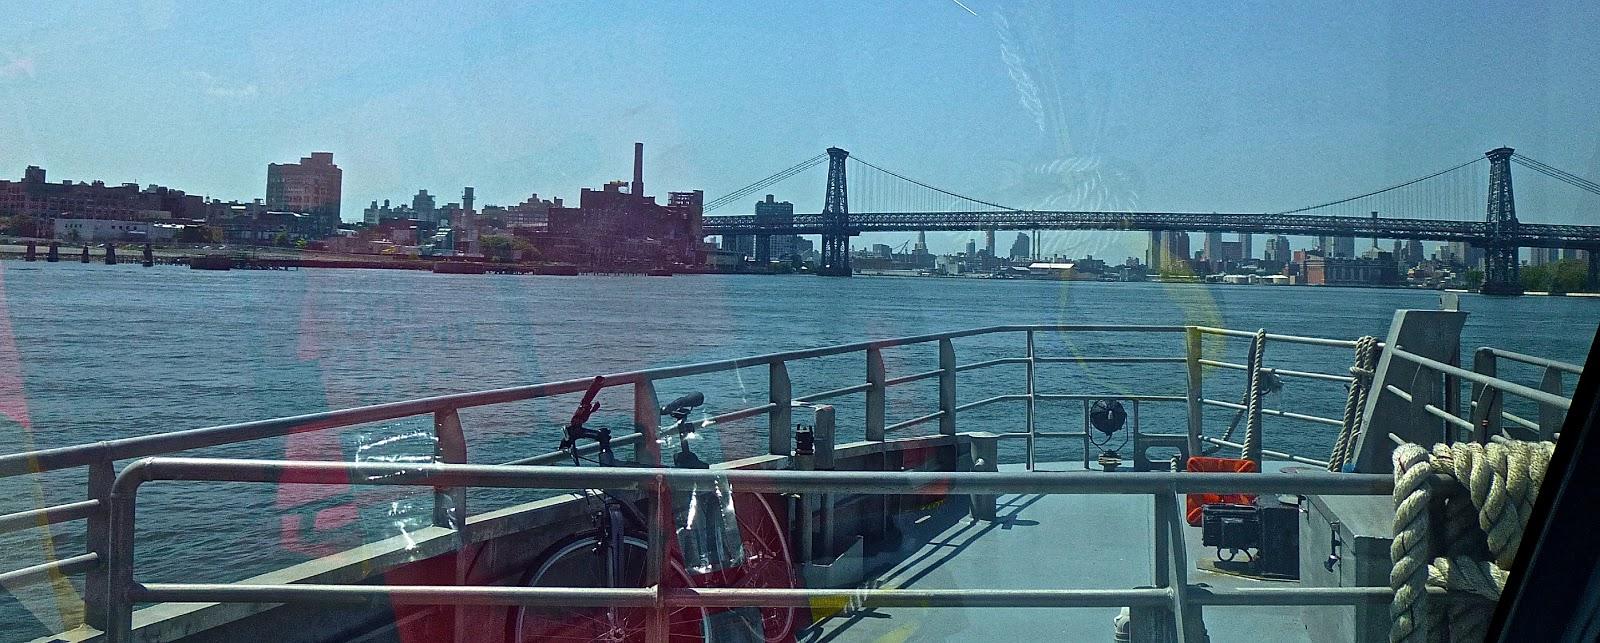 DriveByCuriosity: Lifestyle: A Trip To Sandy Hook, New